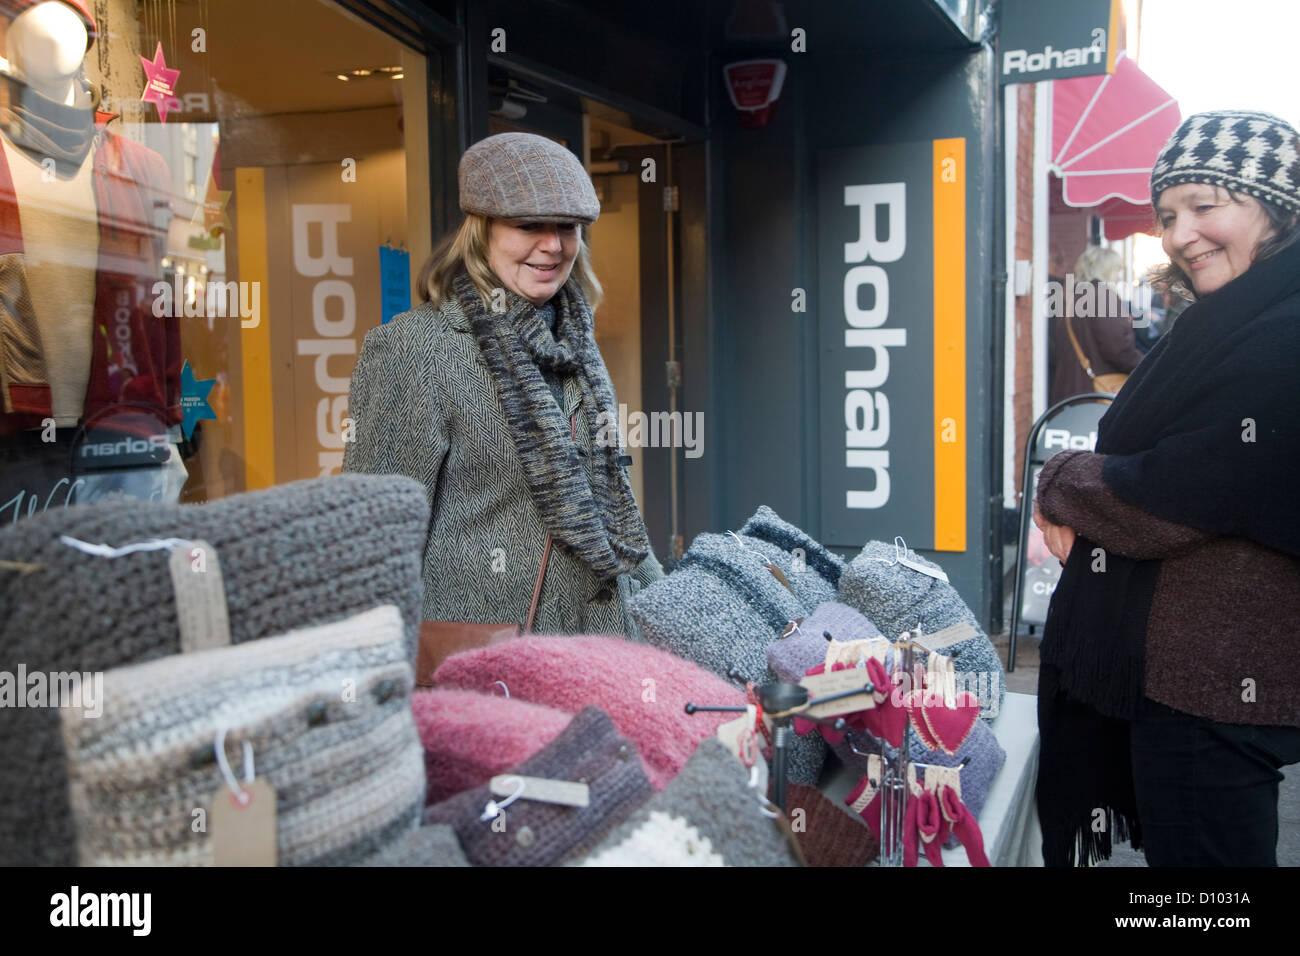 Woman at stall selling wool cushions Christmas street fair Woodbridge, Suffolk, England - Stock Image